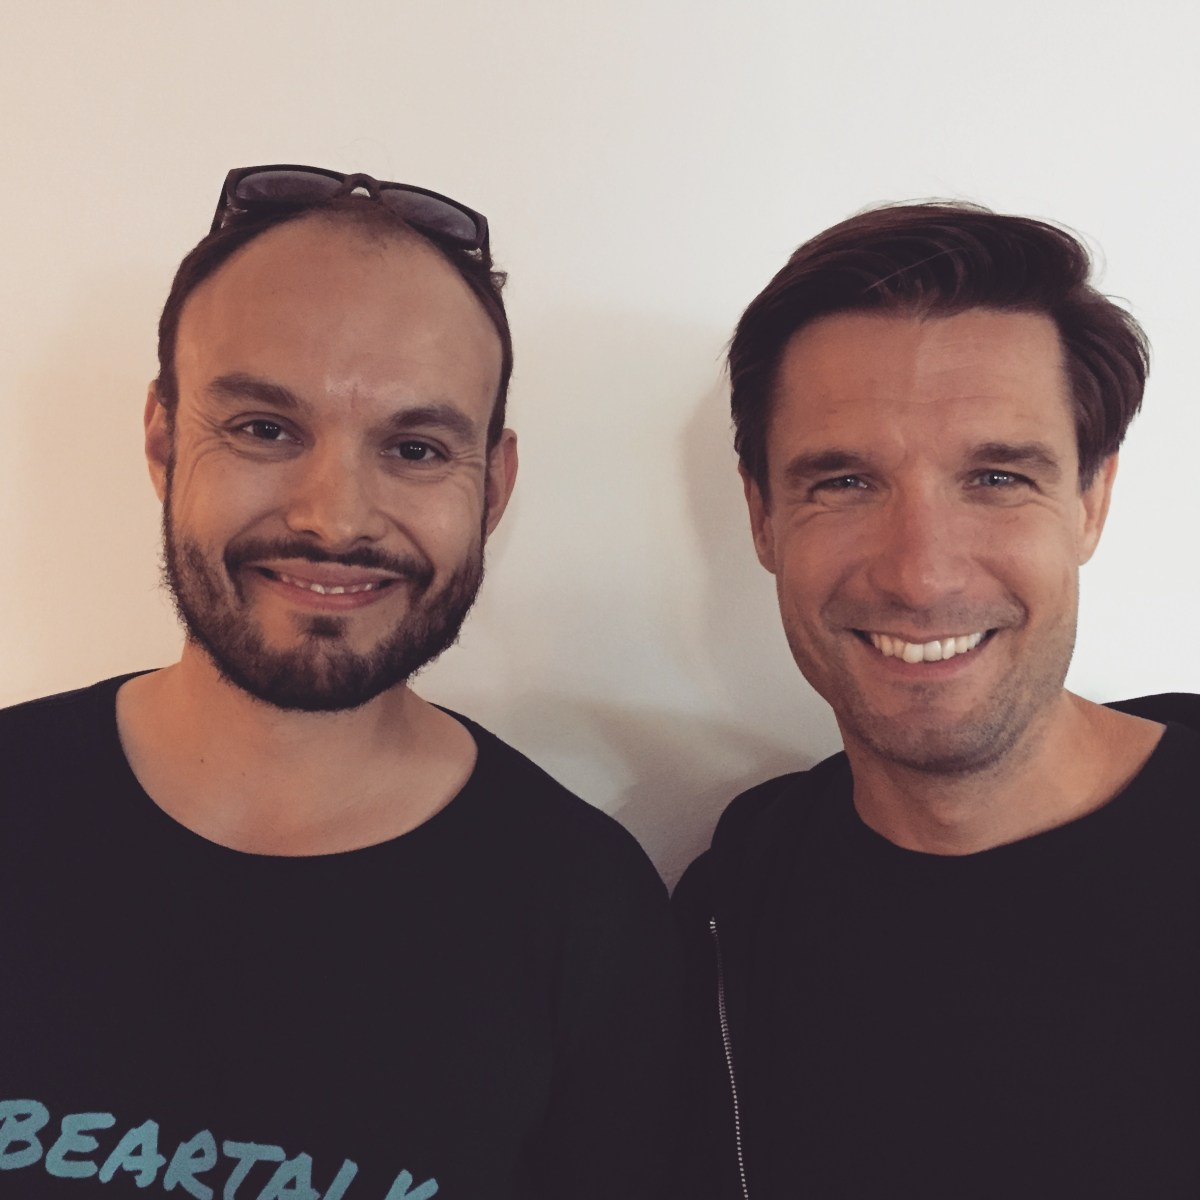 Beartalk Episode 27 - Morten Resen